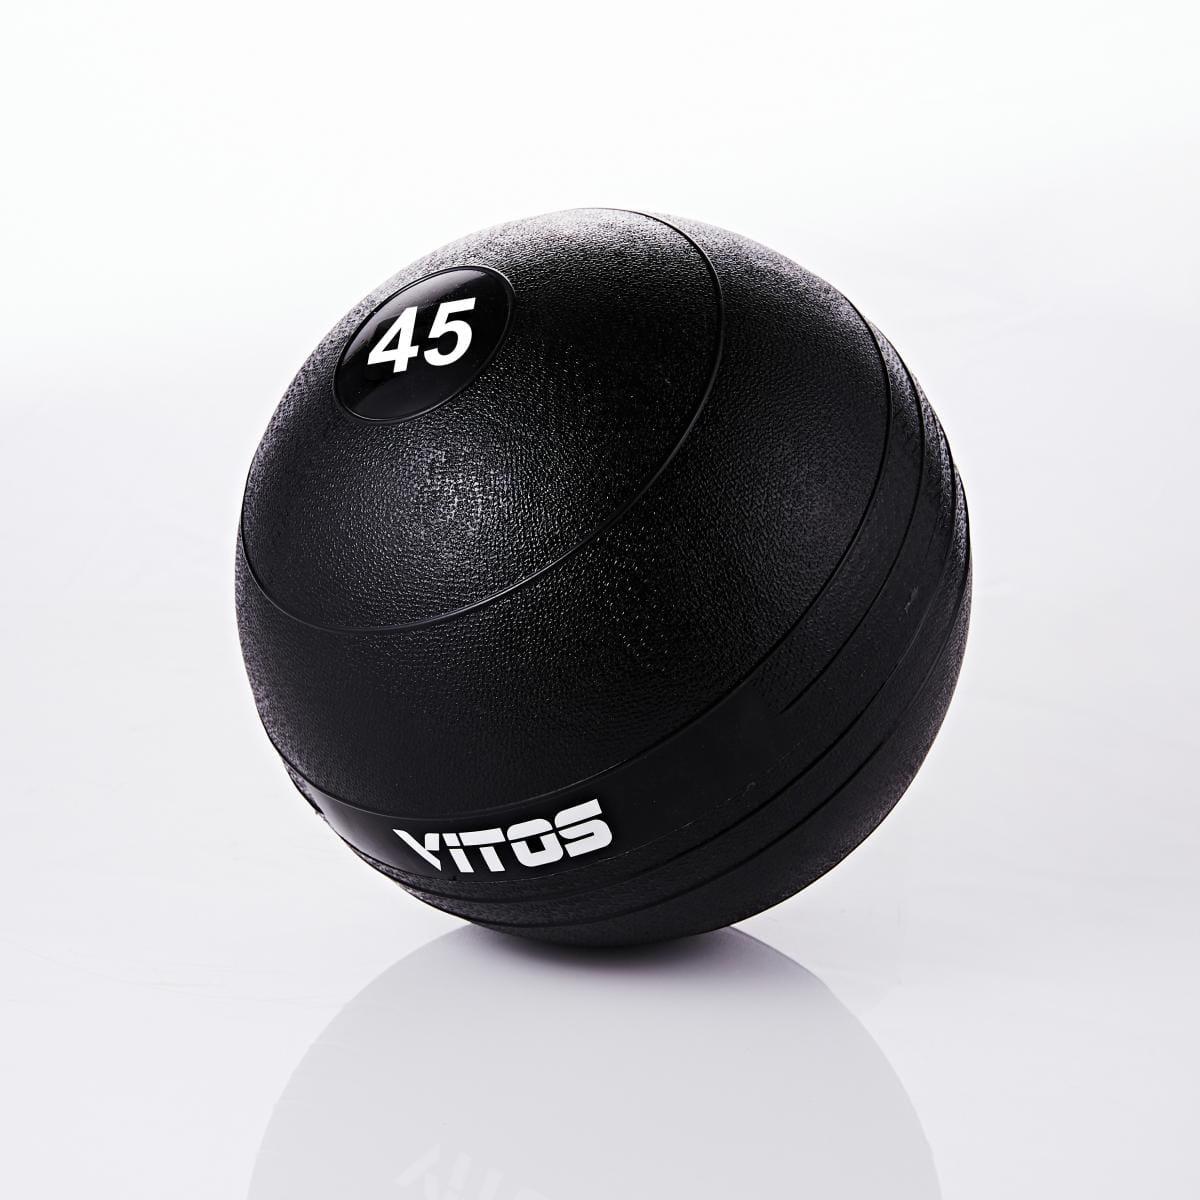 VITOS 重力球 45磅 20公斤 0